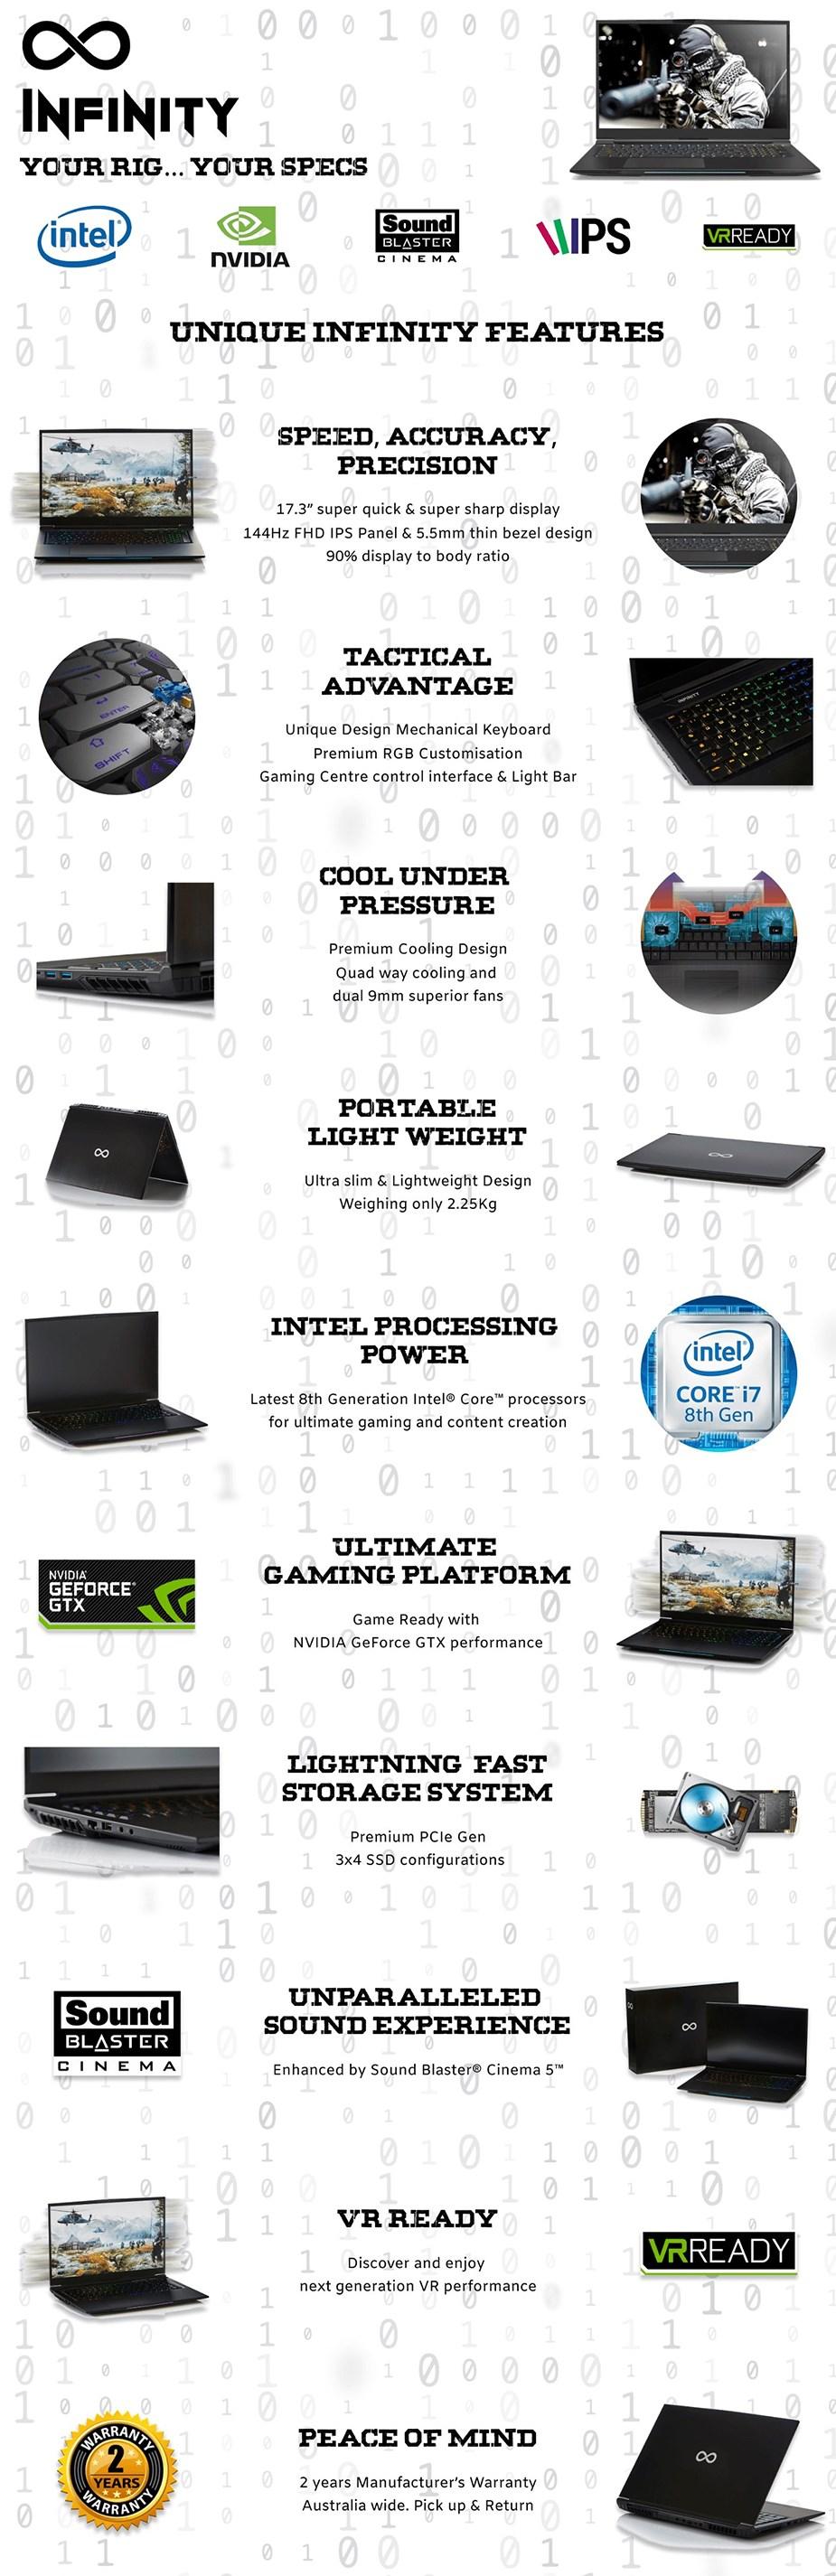 "Infinity S2060-B01 17.3"" 144Hz Gaming Laptop i7-8750H 16GB 512GB+1TB RTX2060 W10 - Desktop Overview 1"